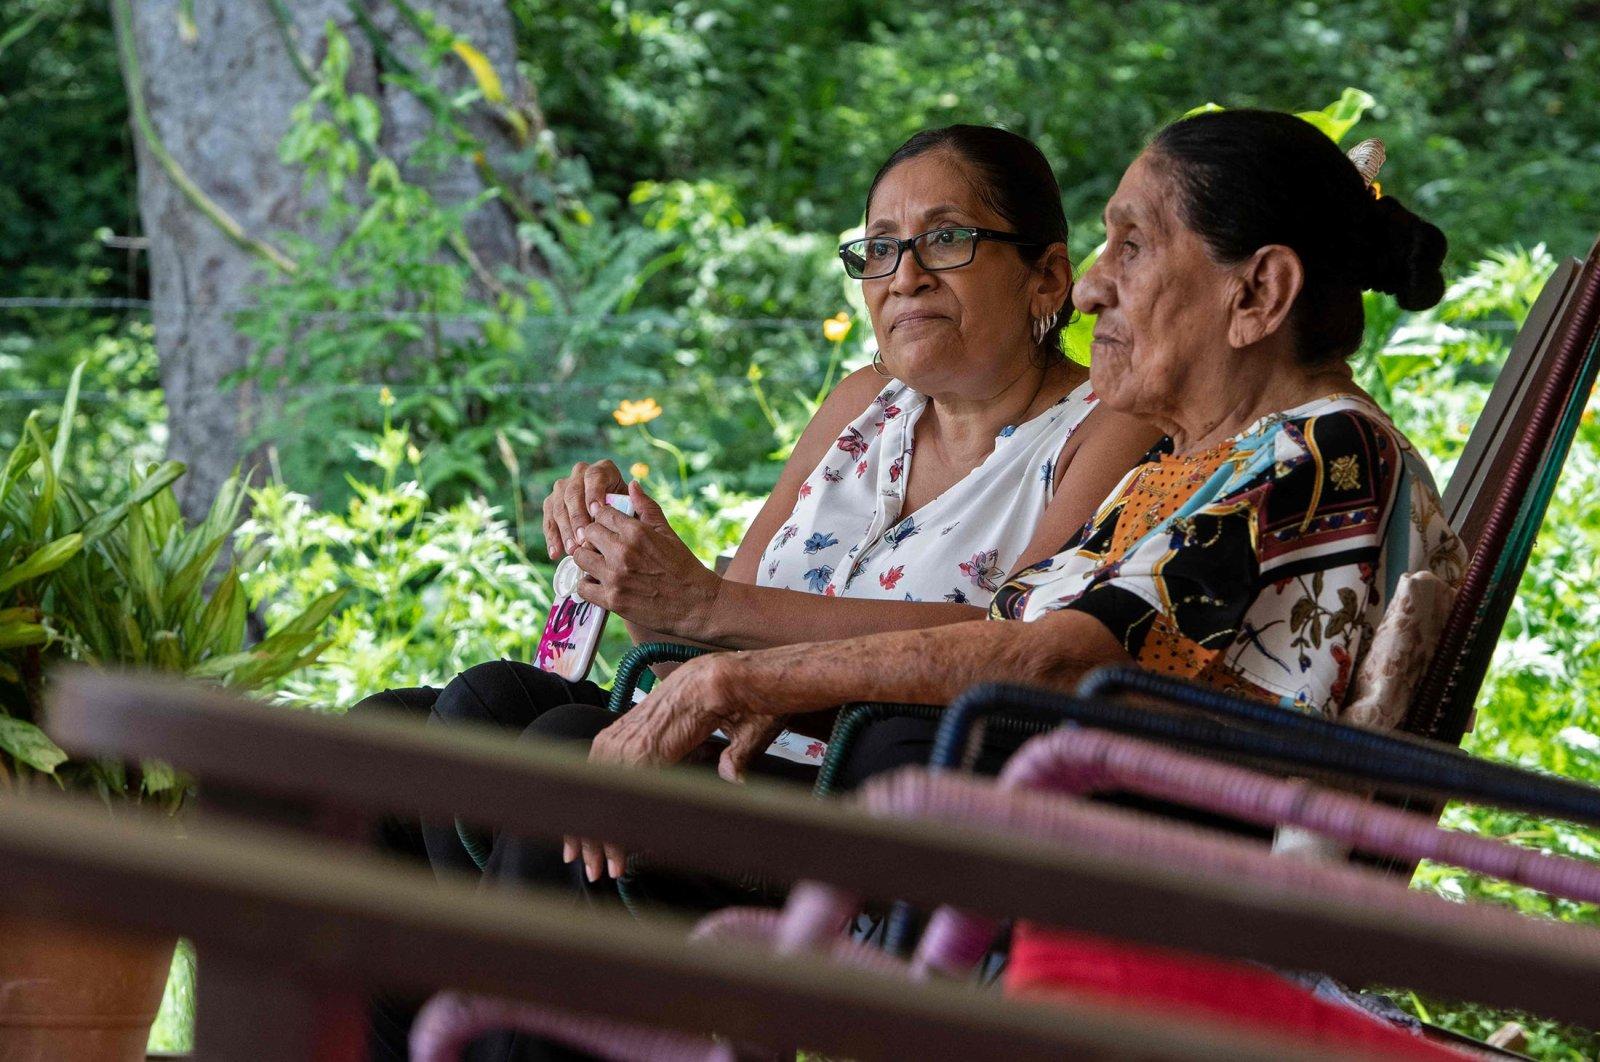 "Natividad ""Talia"" Matarrita Fonseca (R), 93, sits next to her sister Sara Fonseca at their home in Nicoya, Costa Rica, Aug. 28, 2021. (AFP Photo)"